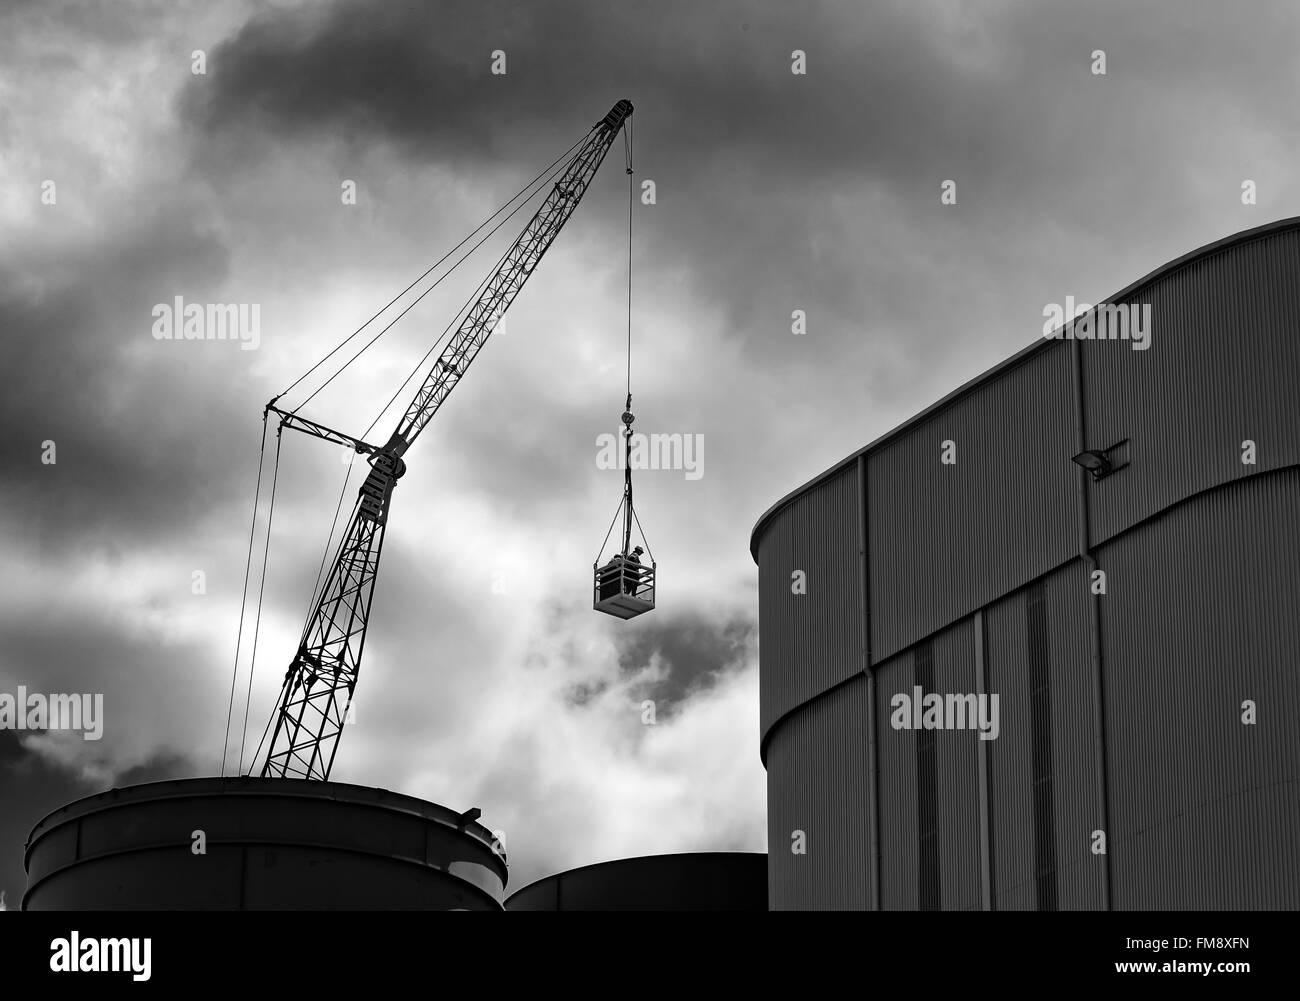 Industrial scene of man in basket under dark sky hoisted by crane onto a silo in brisbane docks - Stock Image